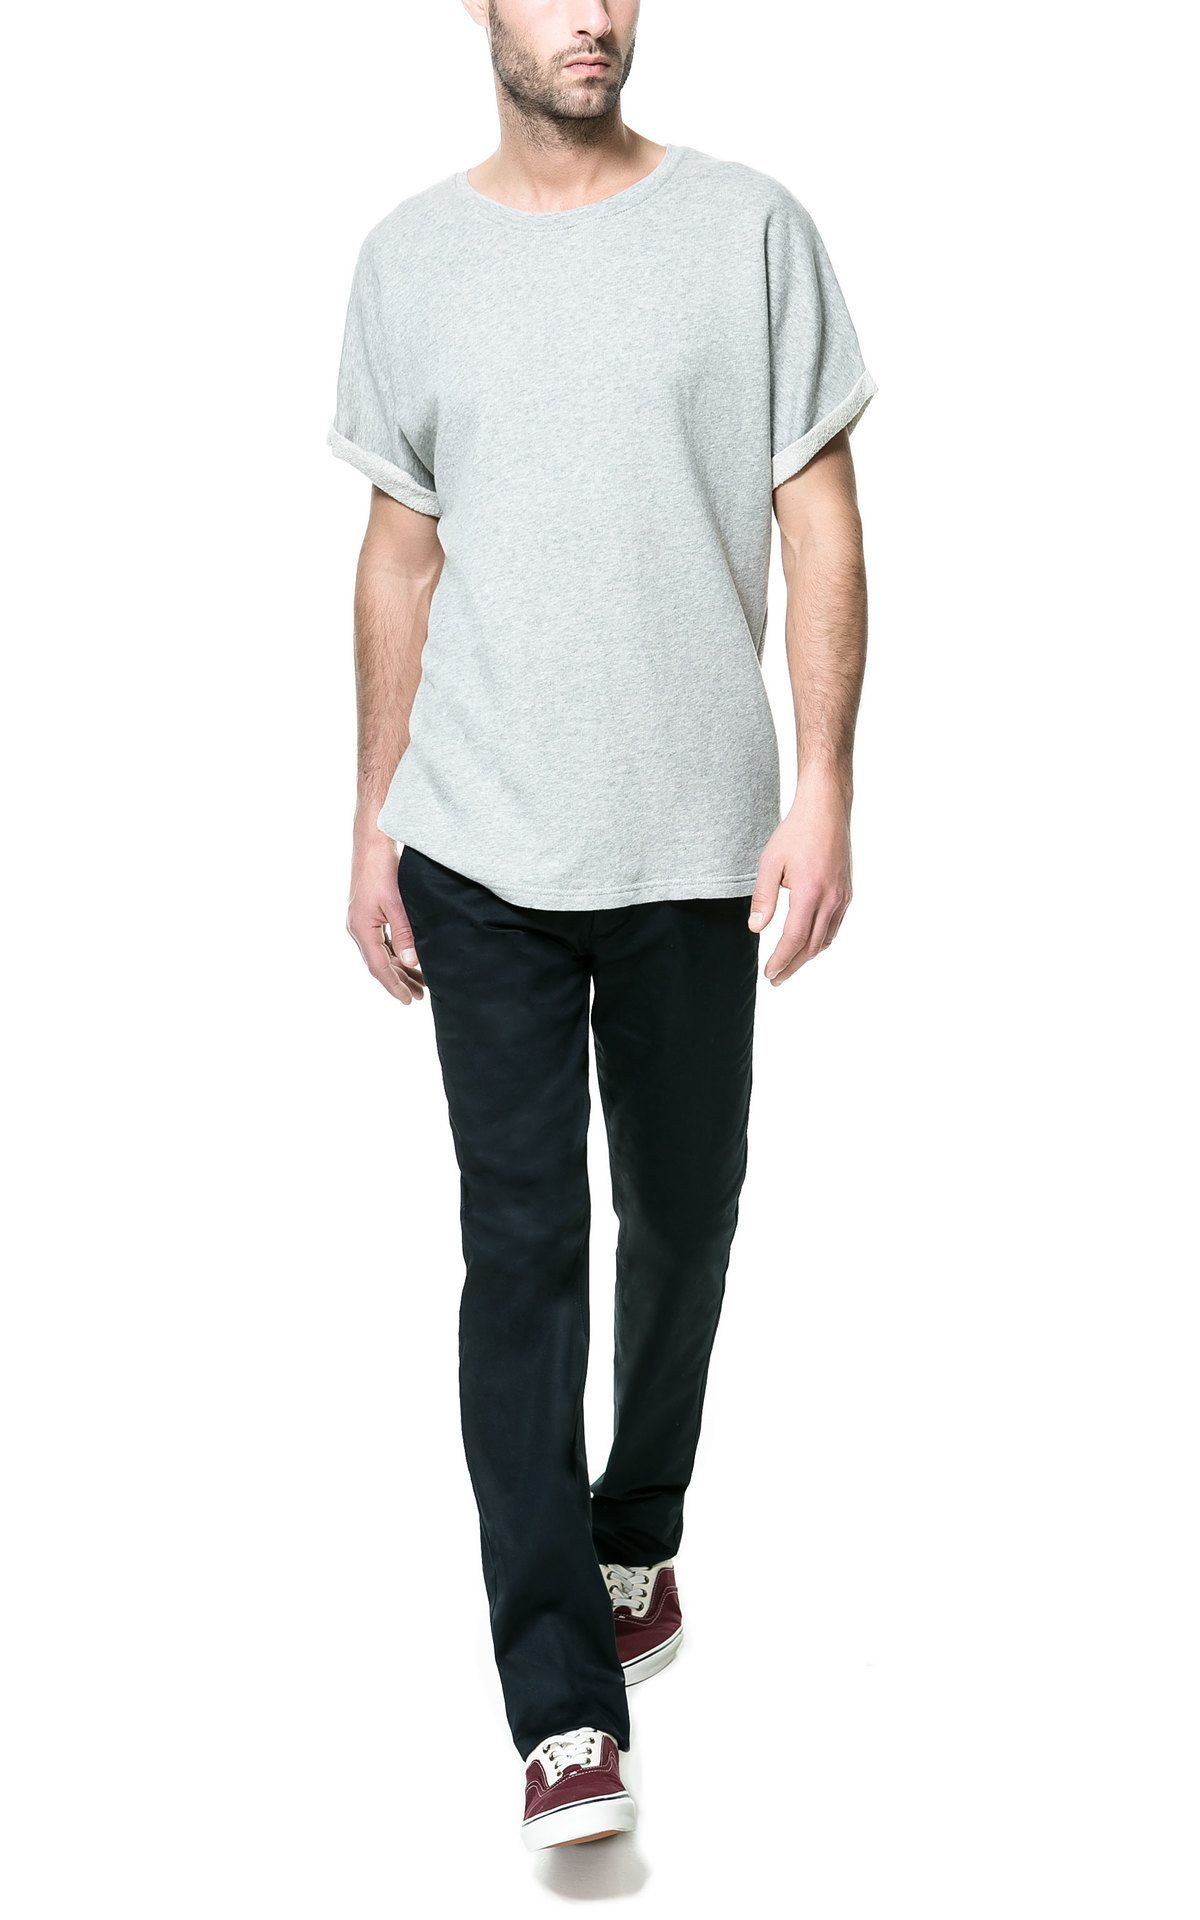 zara-hombre-otono-invierno-2013-2014-pantalones